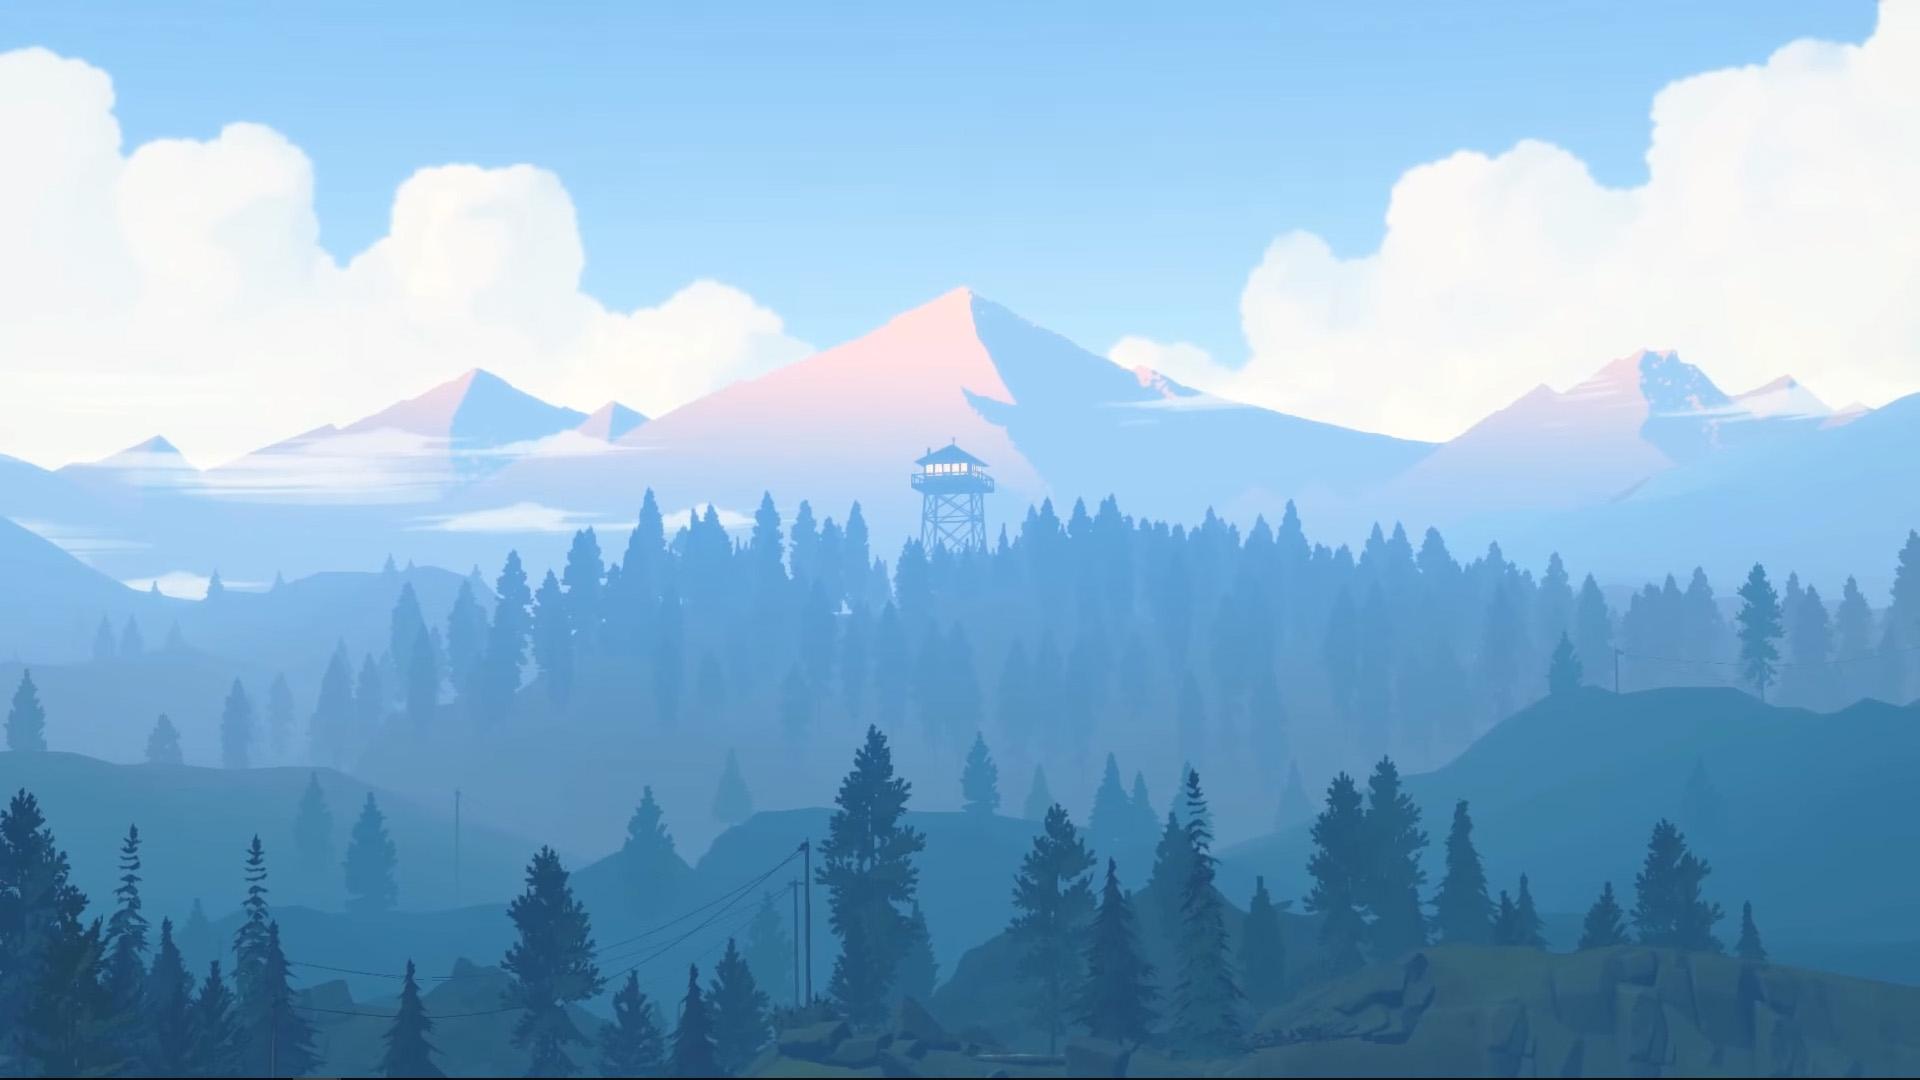 flat design wallpaper,mountainous landforms,mountain,mountain range,sky,natural landscape